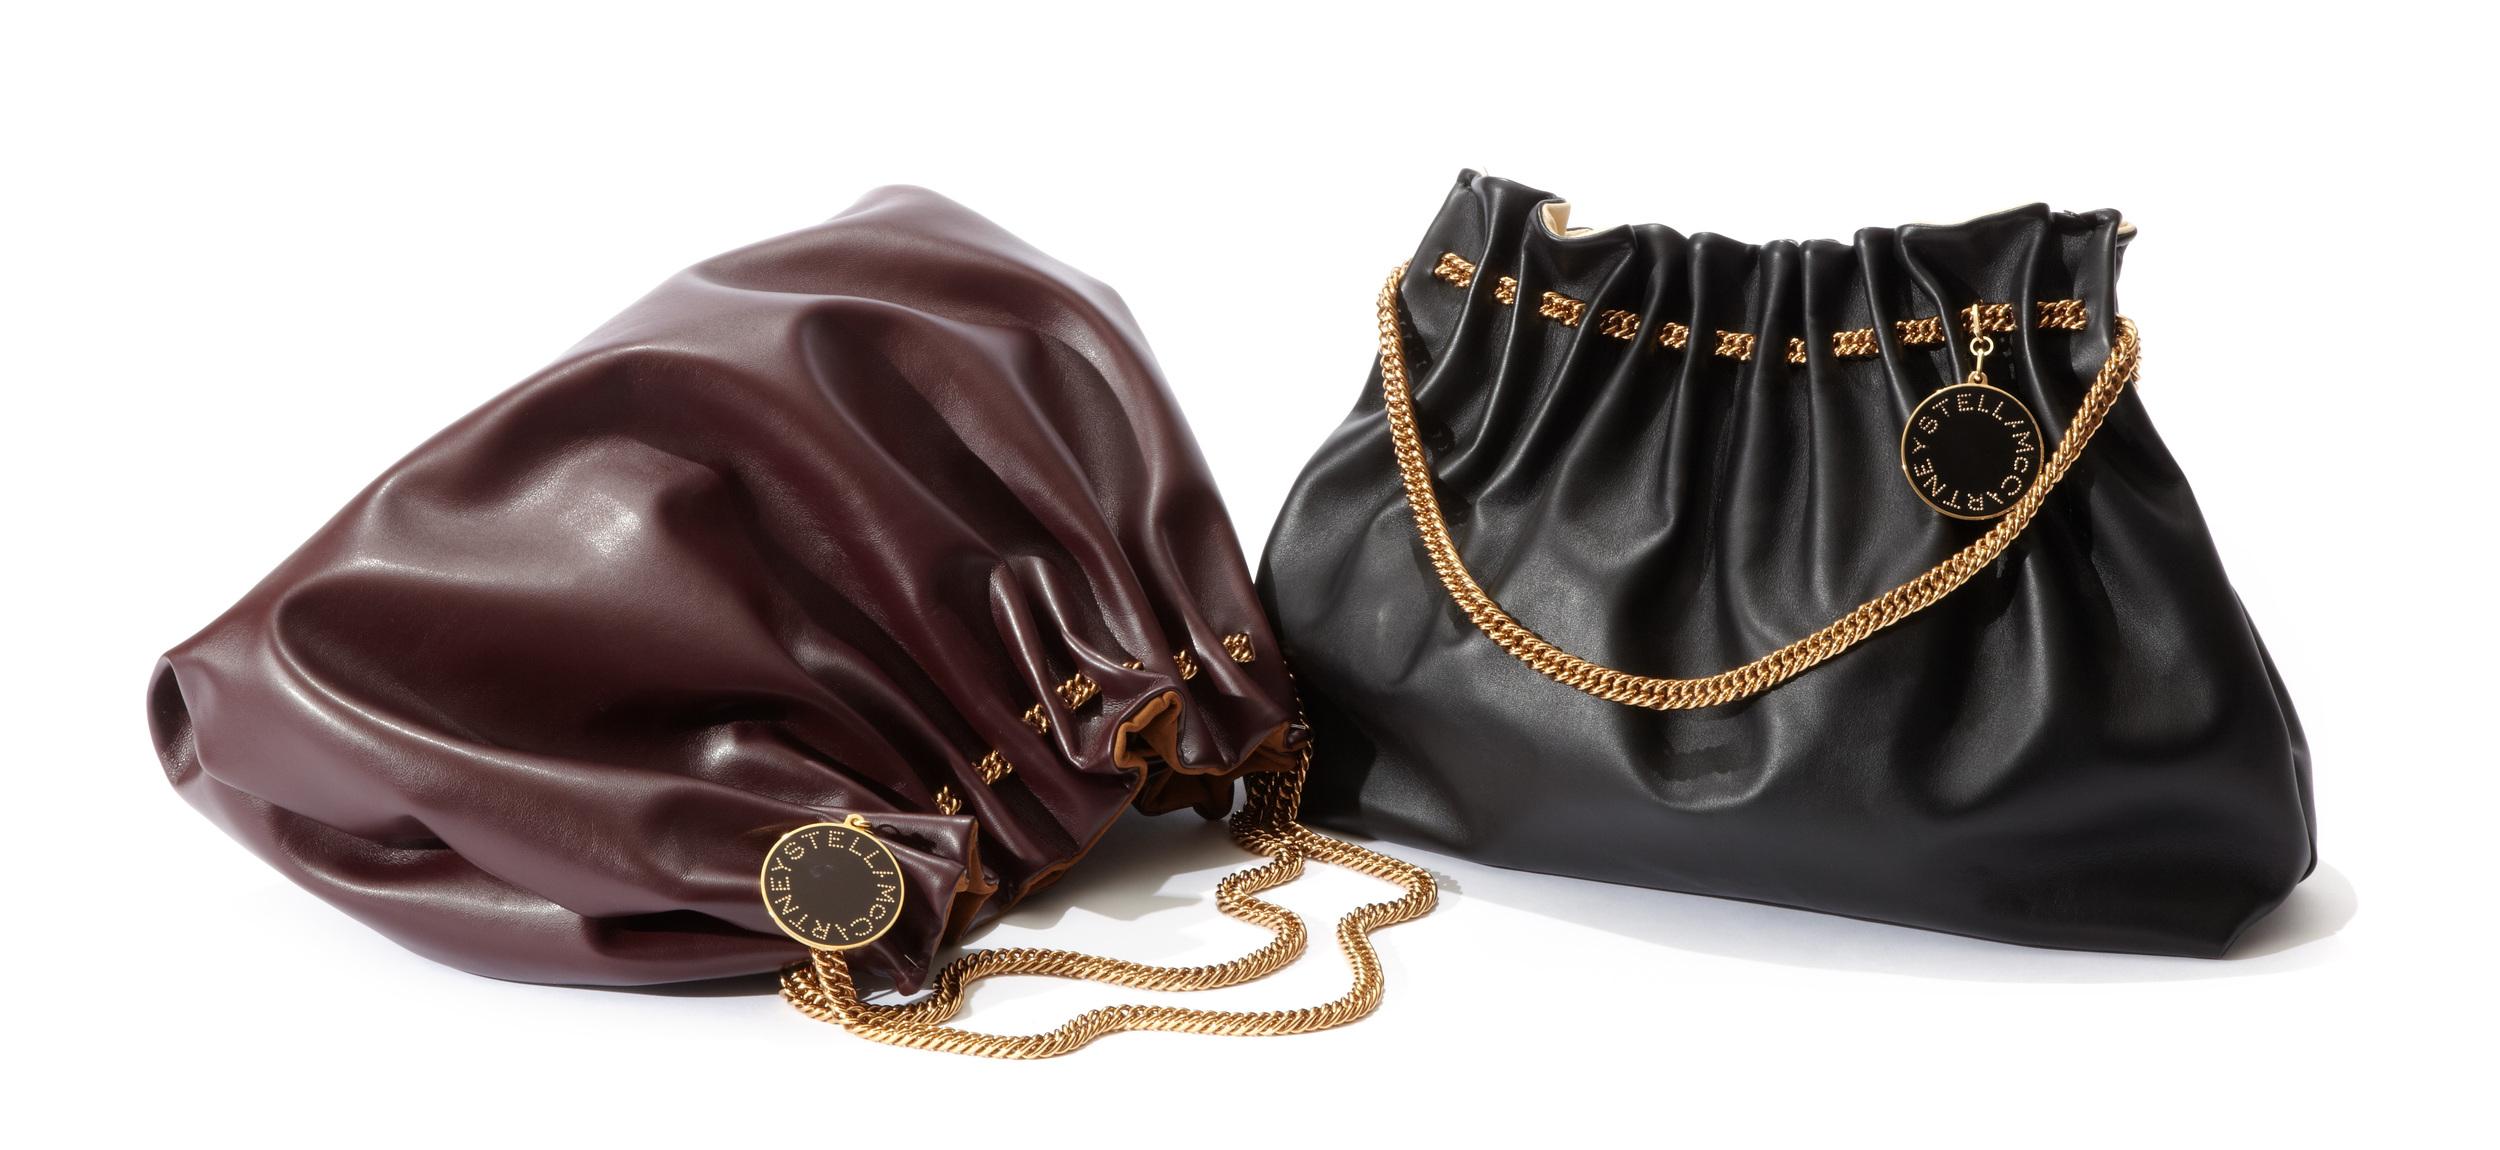 Stella-McCartney-bags.jpg